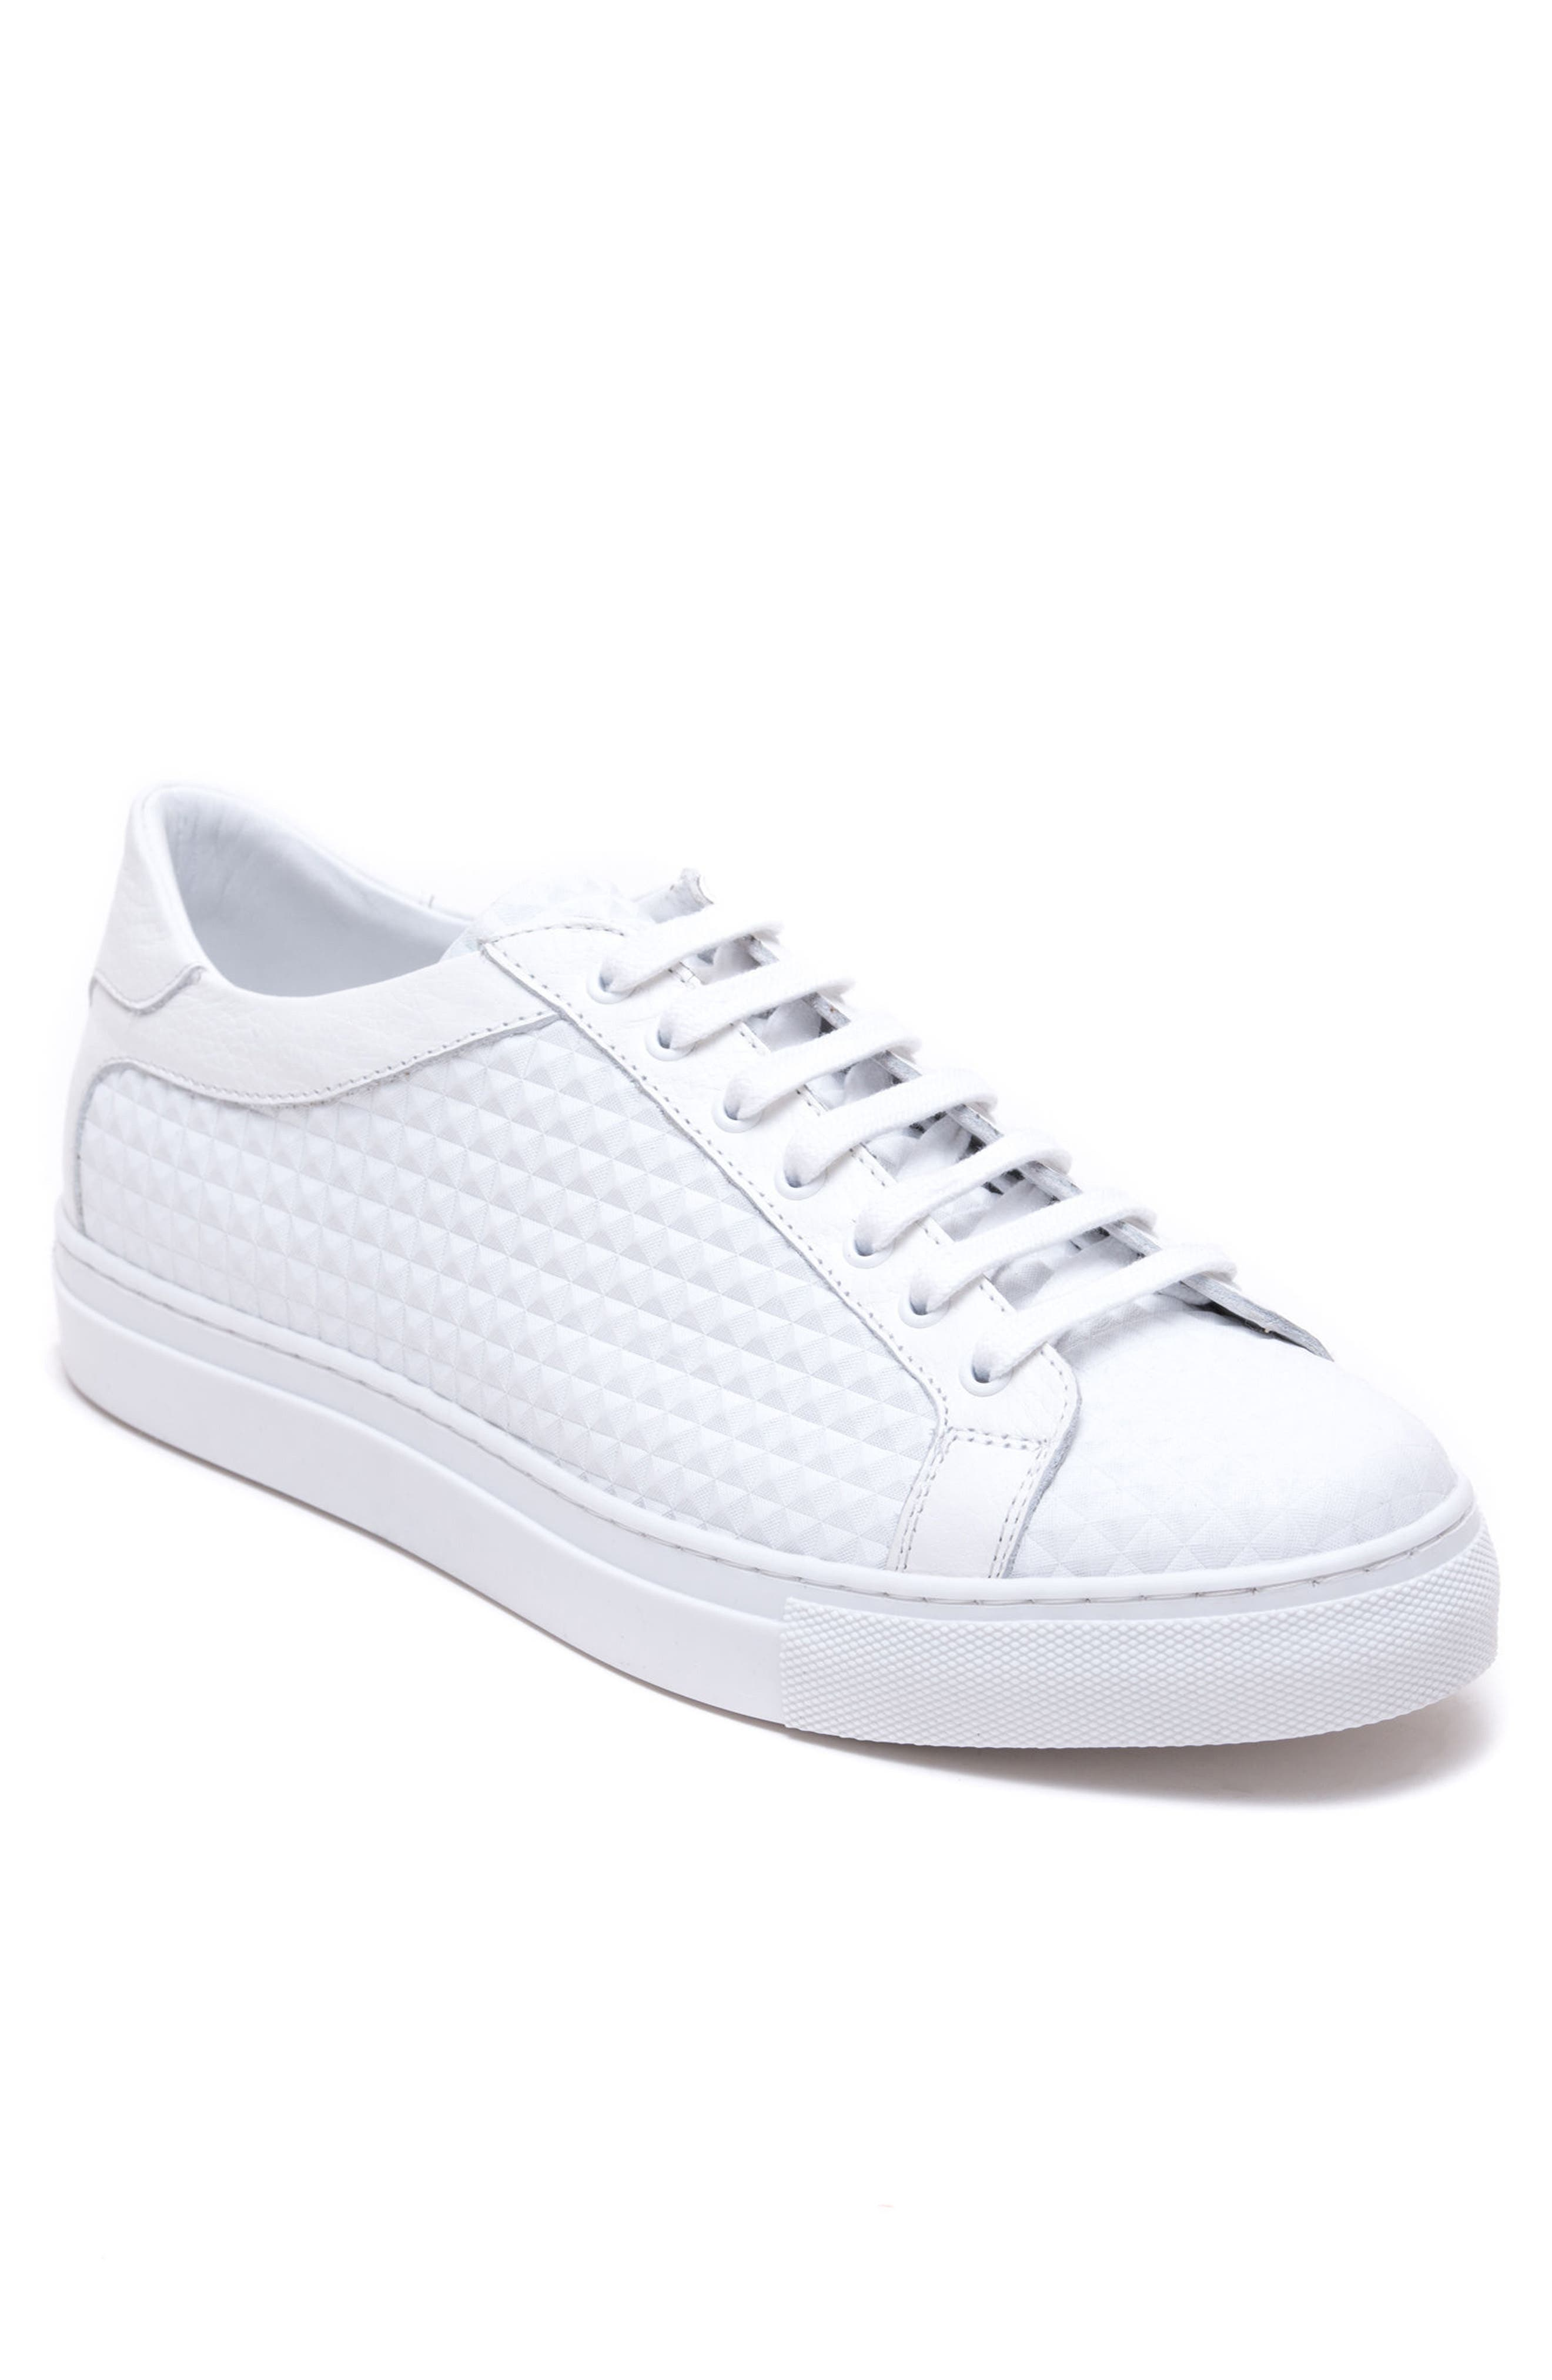 Scott Leather Sneaker,                         Main,                         color, White